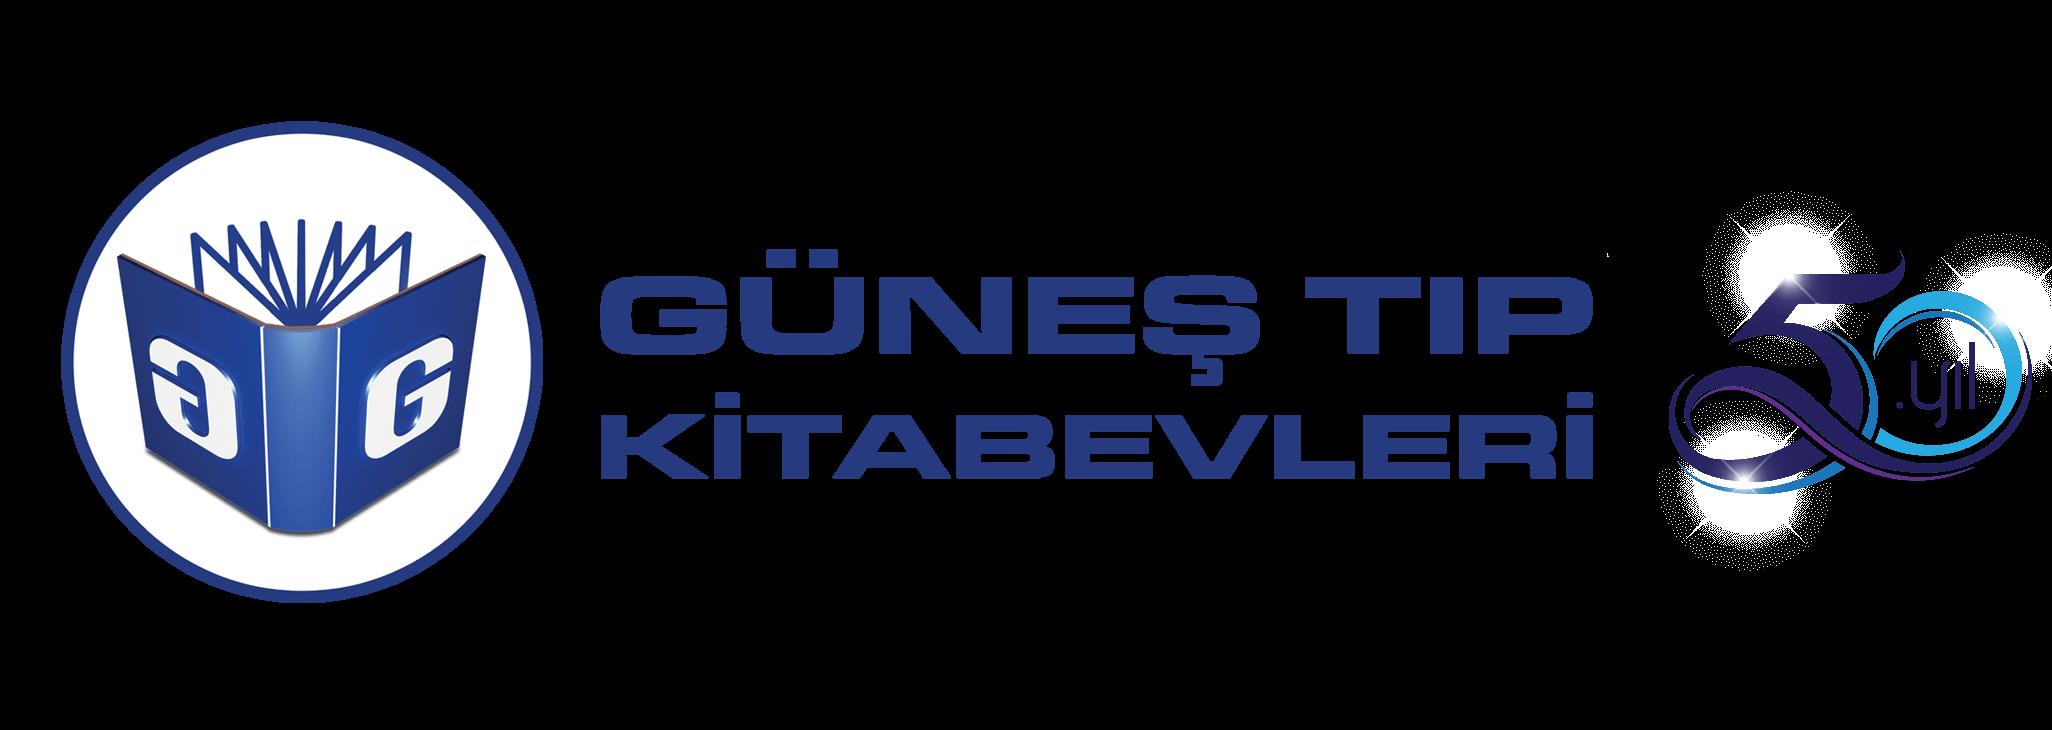 guneskitabevi.com